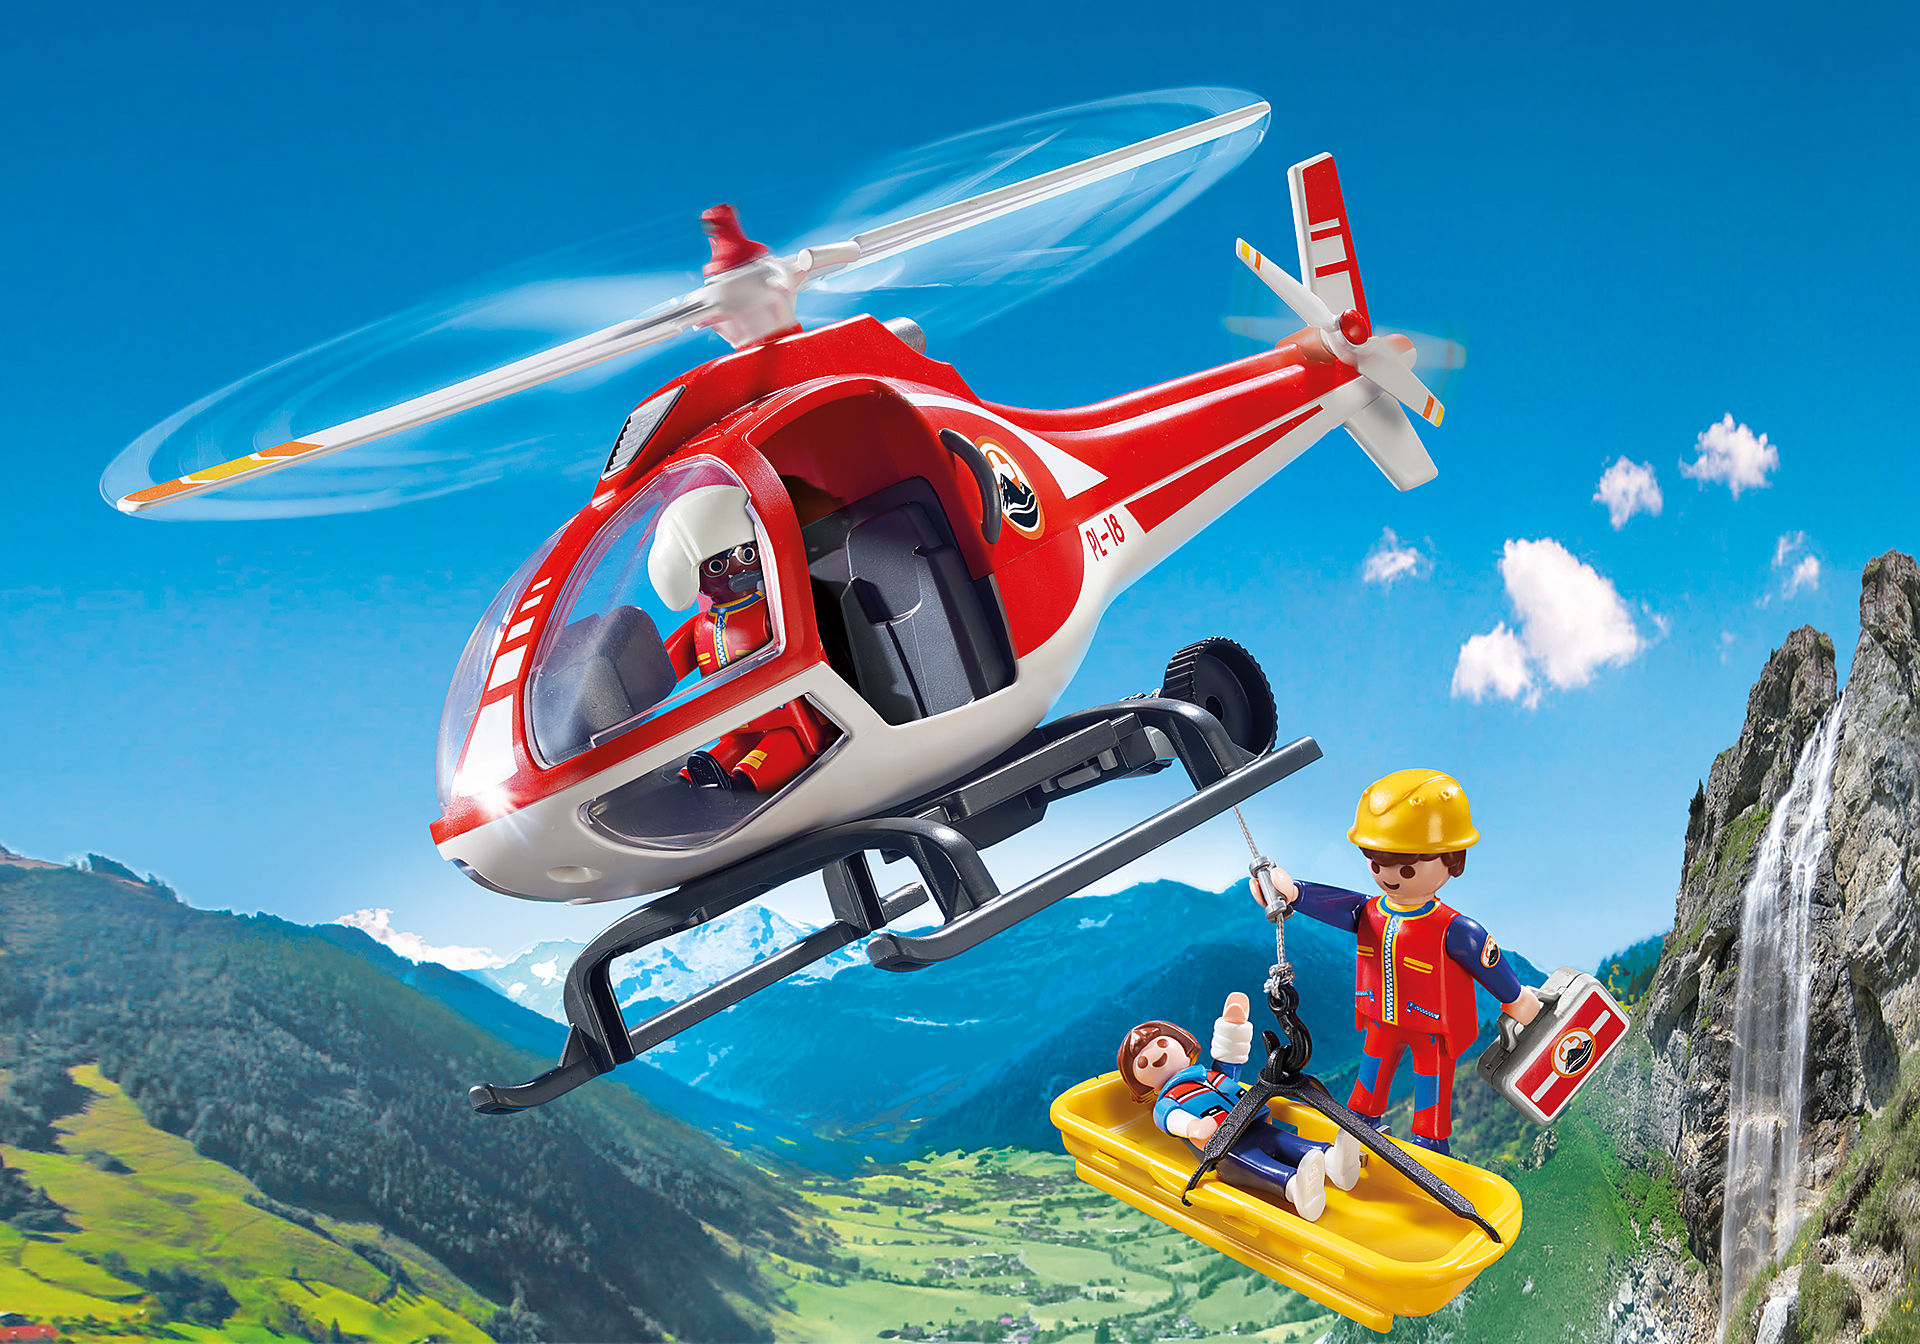 http://media.playmobil.com/i/playmobil/9127_product_detail/Secouristes des montagnes avec hélicoptère